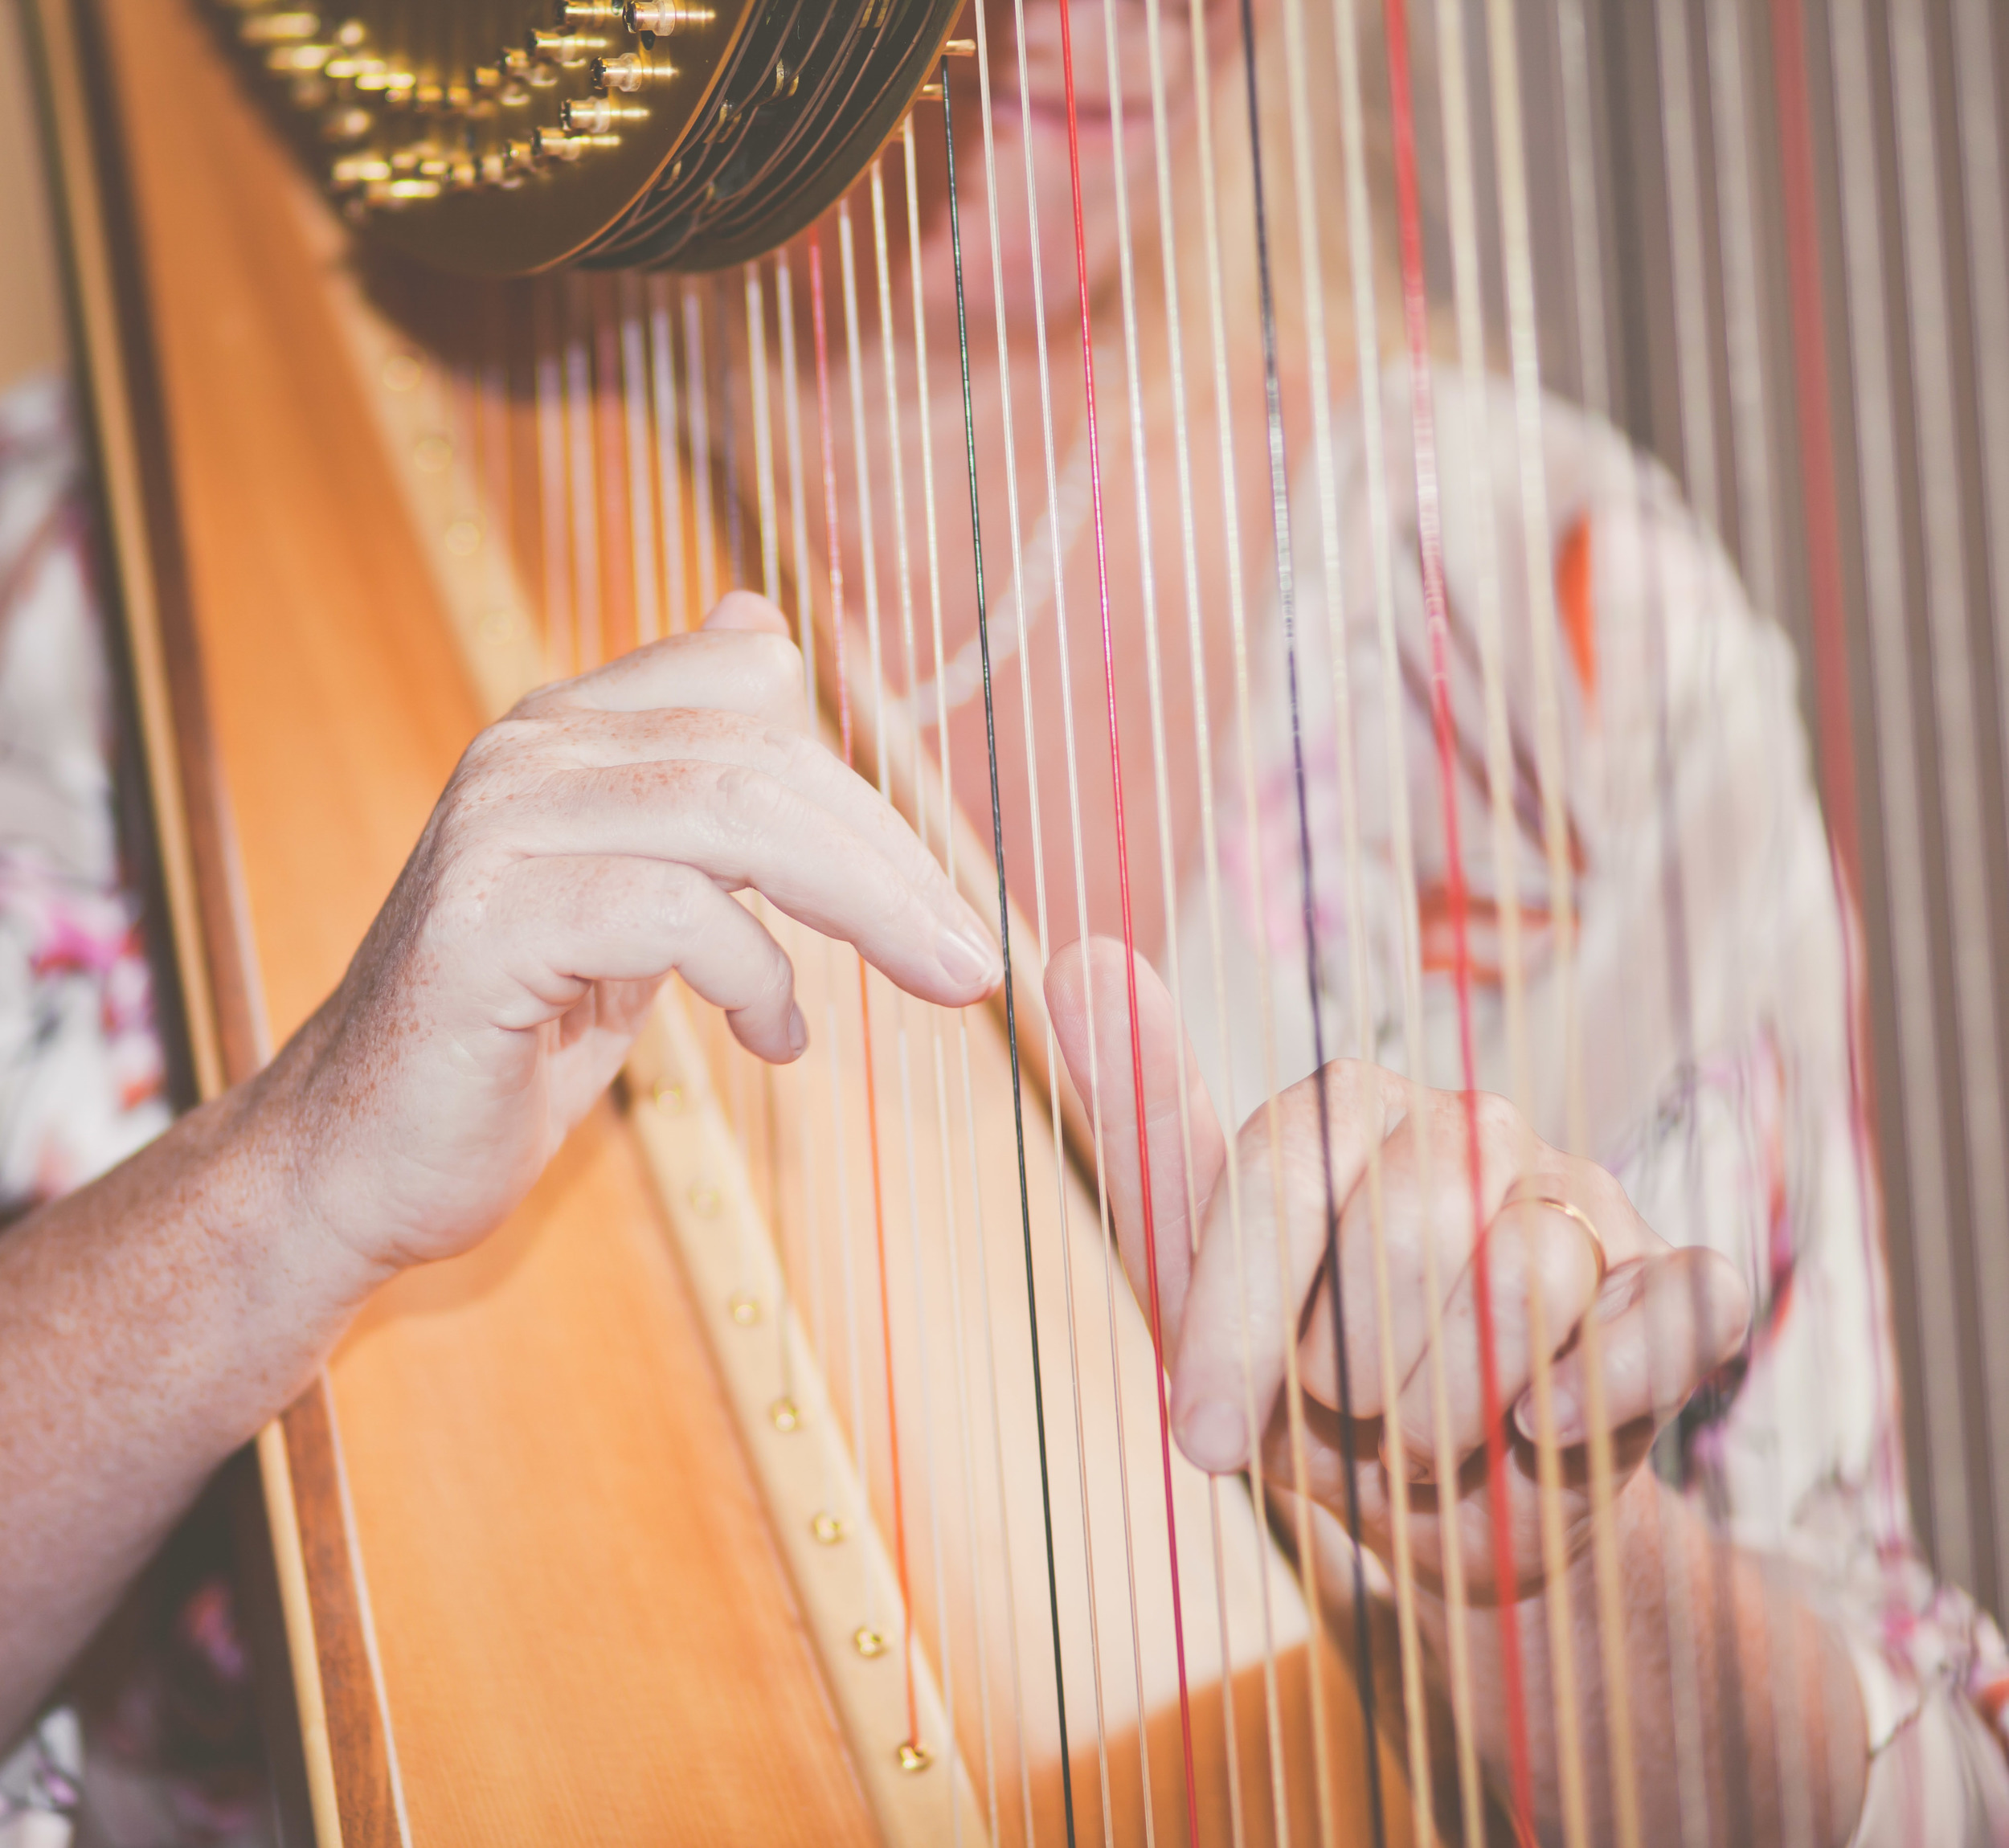 014  - Xenia Horne UK Harpist by Mark Pugh www.markpugh.com -15.JPG